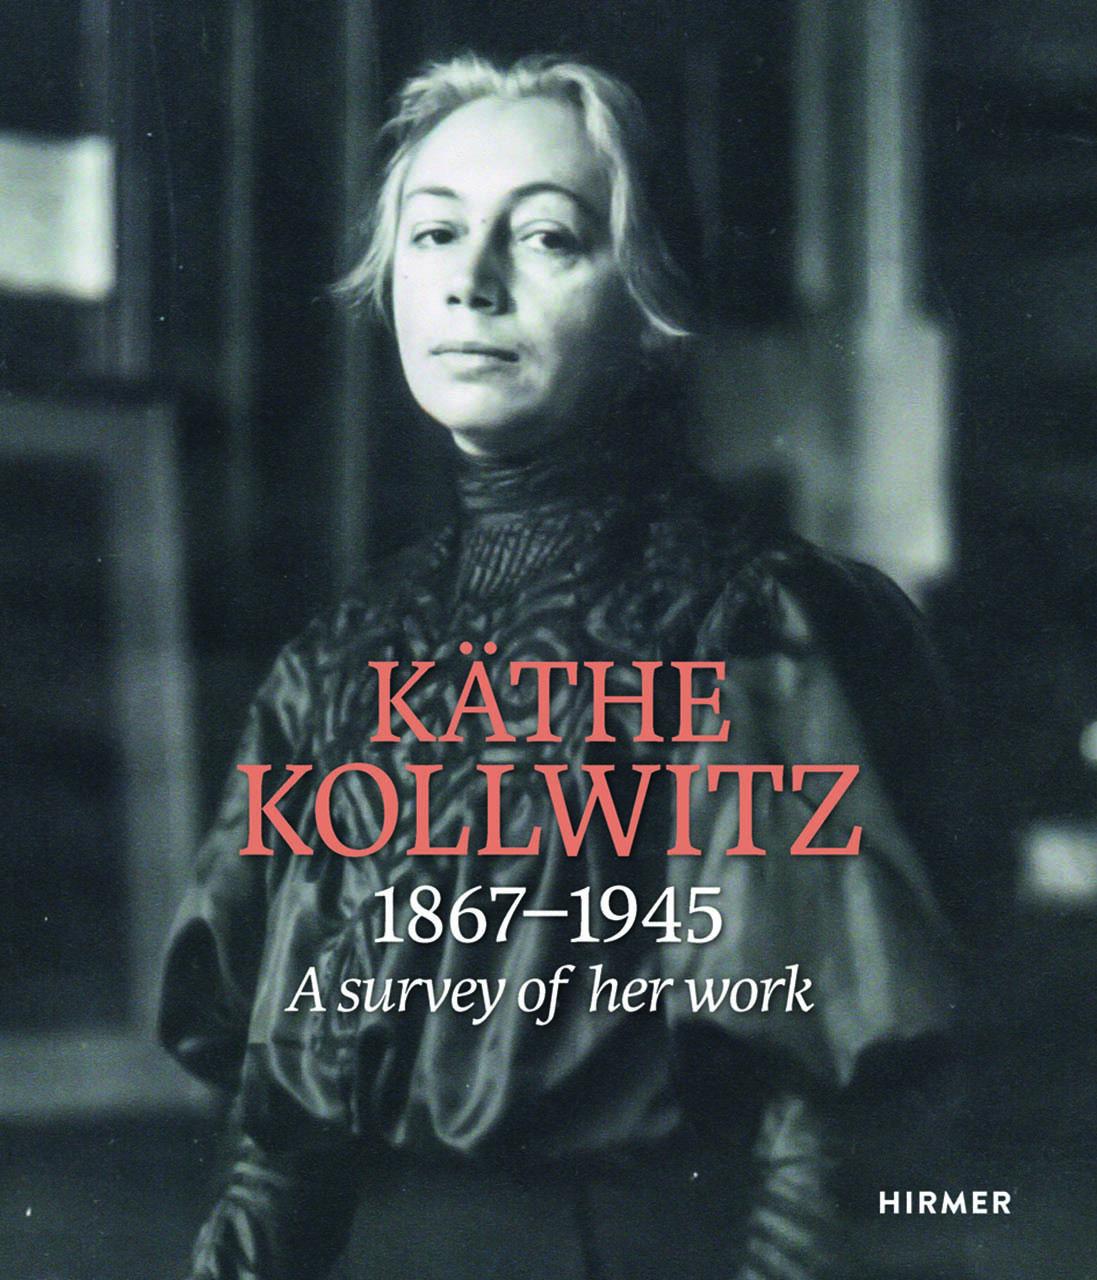 Käthe Kollwitz: A Survey of Her Work 1867 - 1945